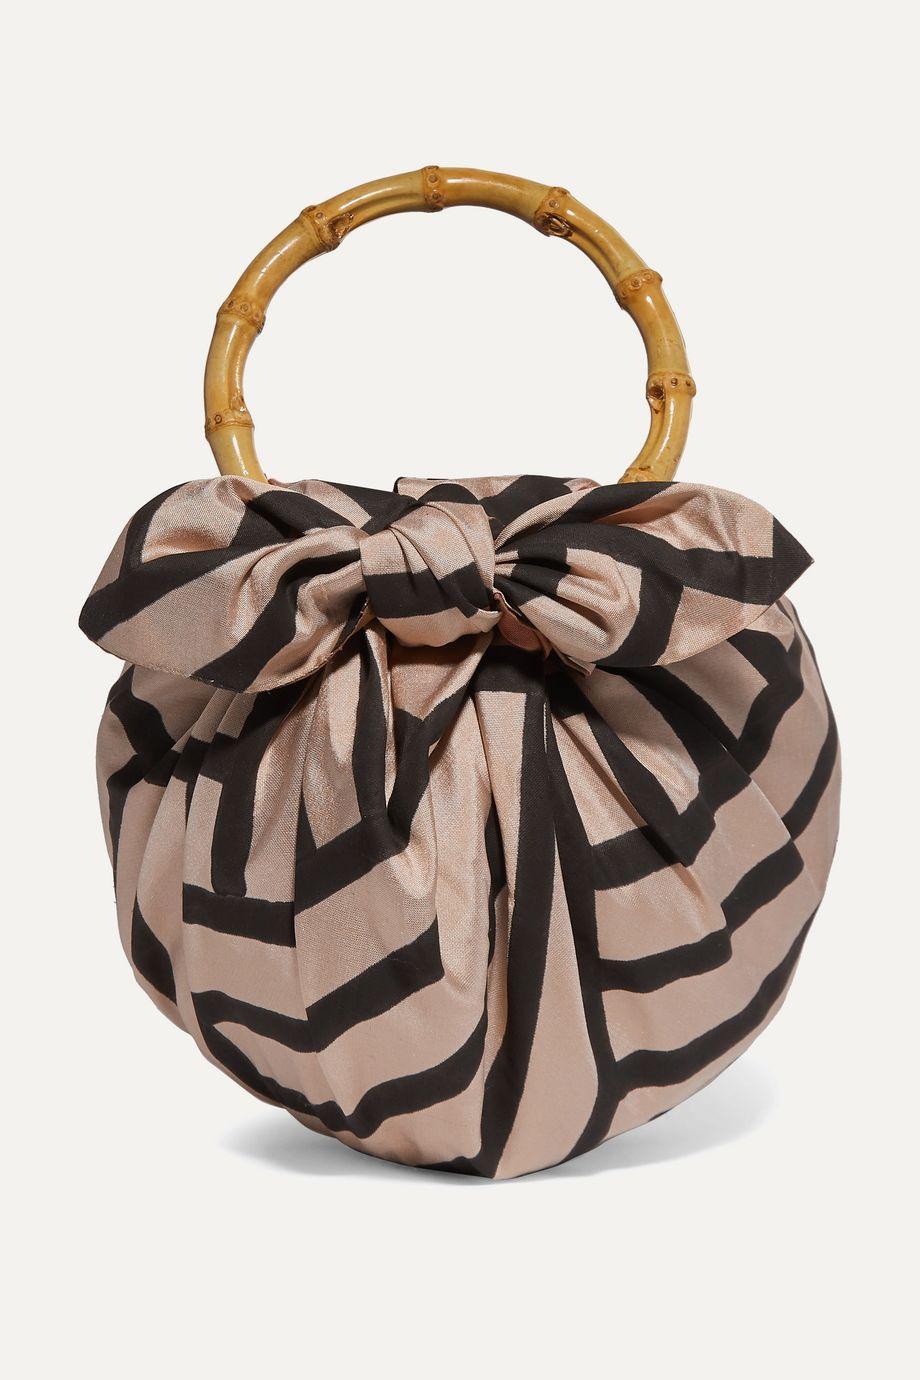 Emily Levine Dumpling knotted striped silk-blend tote